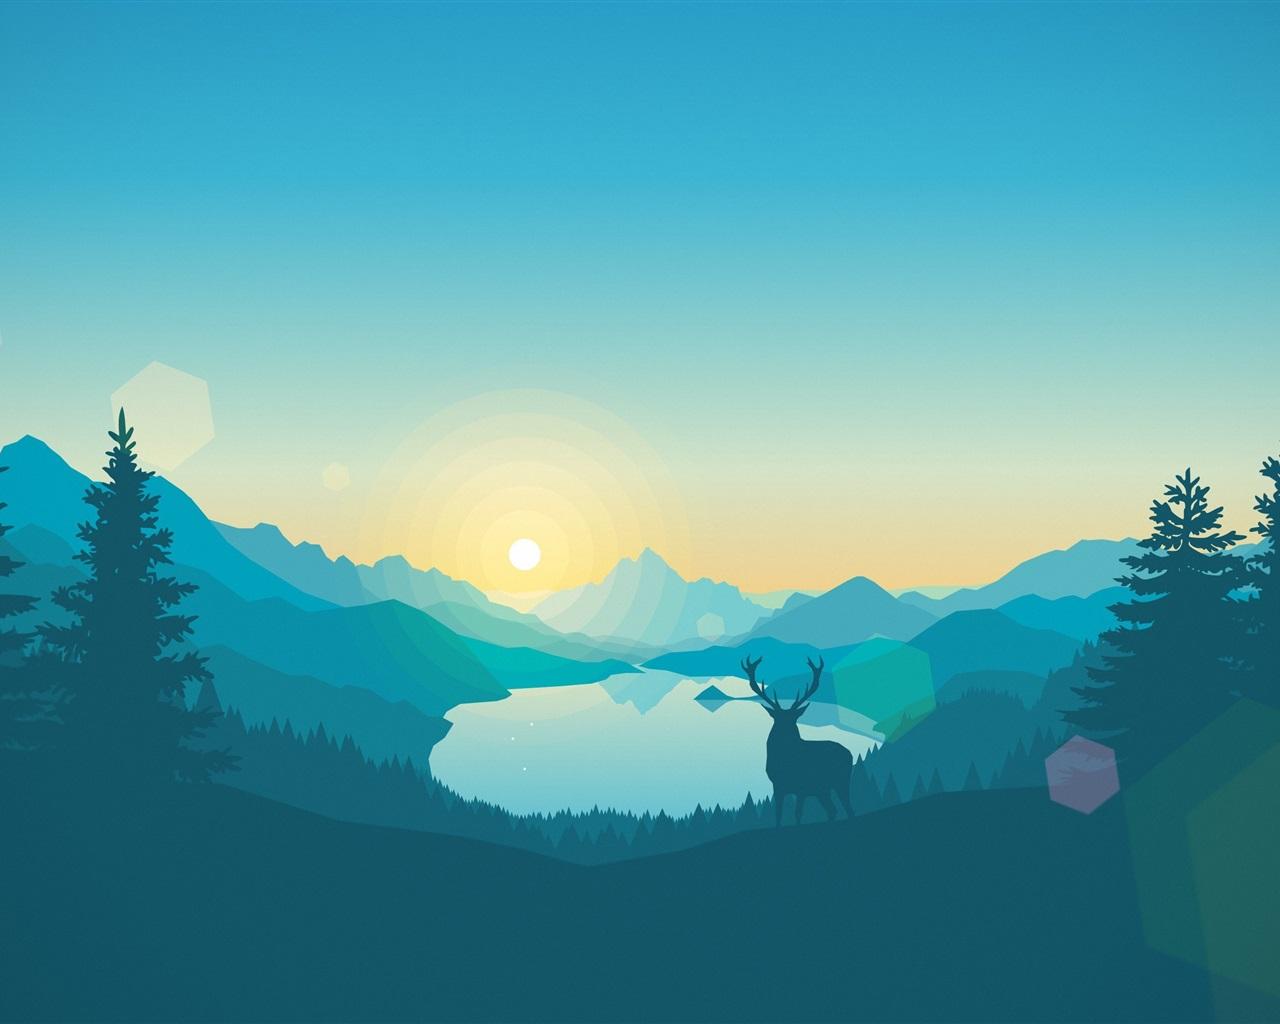 Wallpaper Vector design, landscape, mountains, lake, trees ...